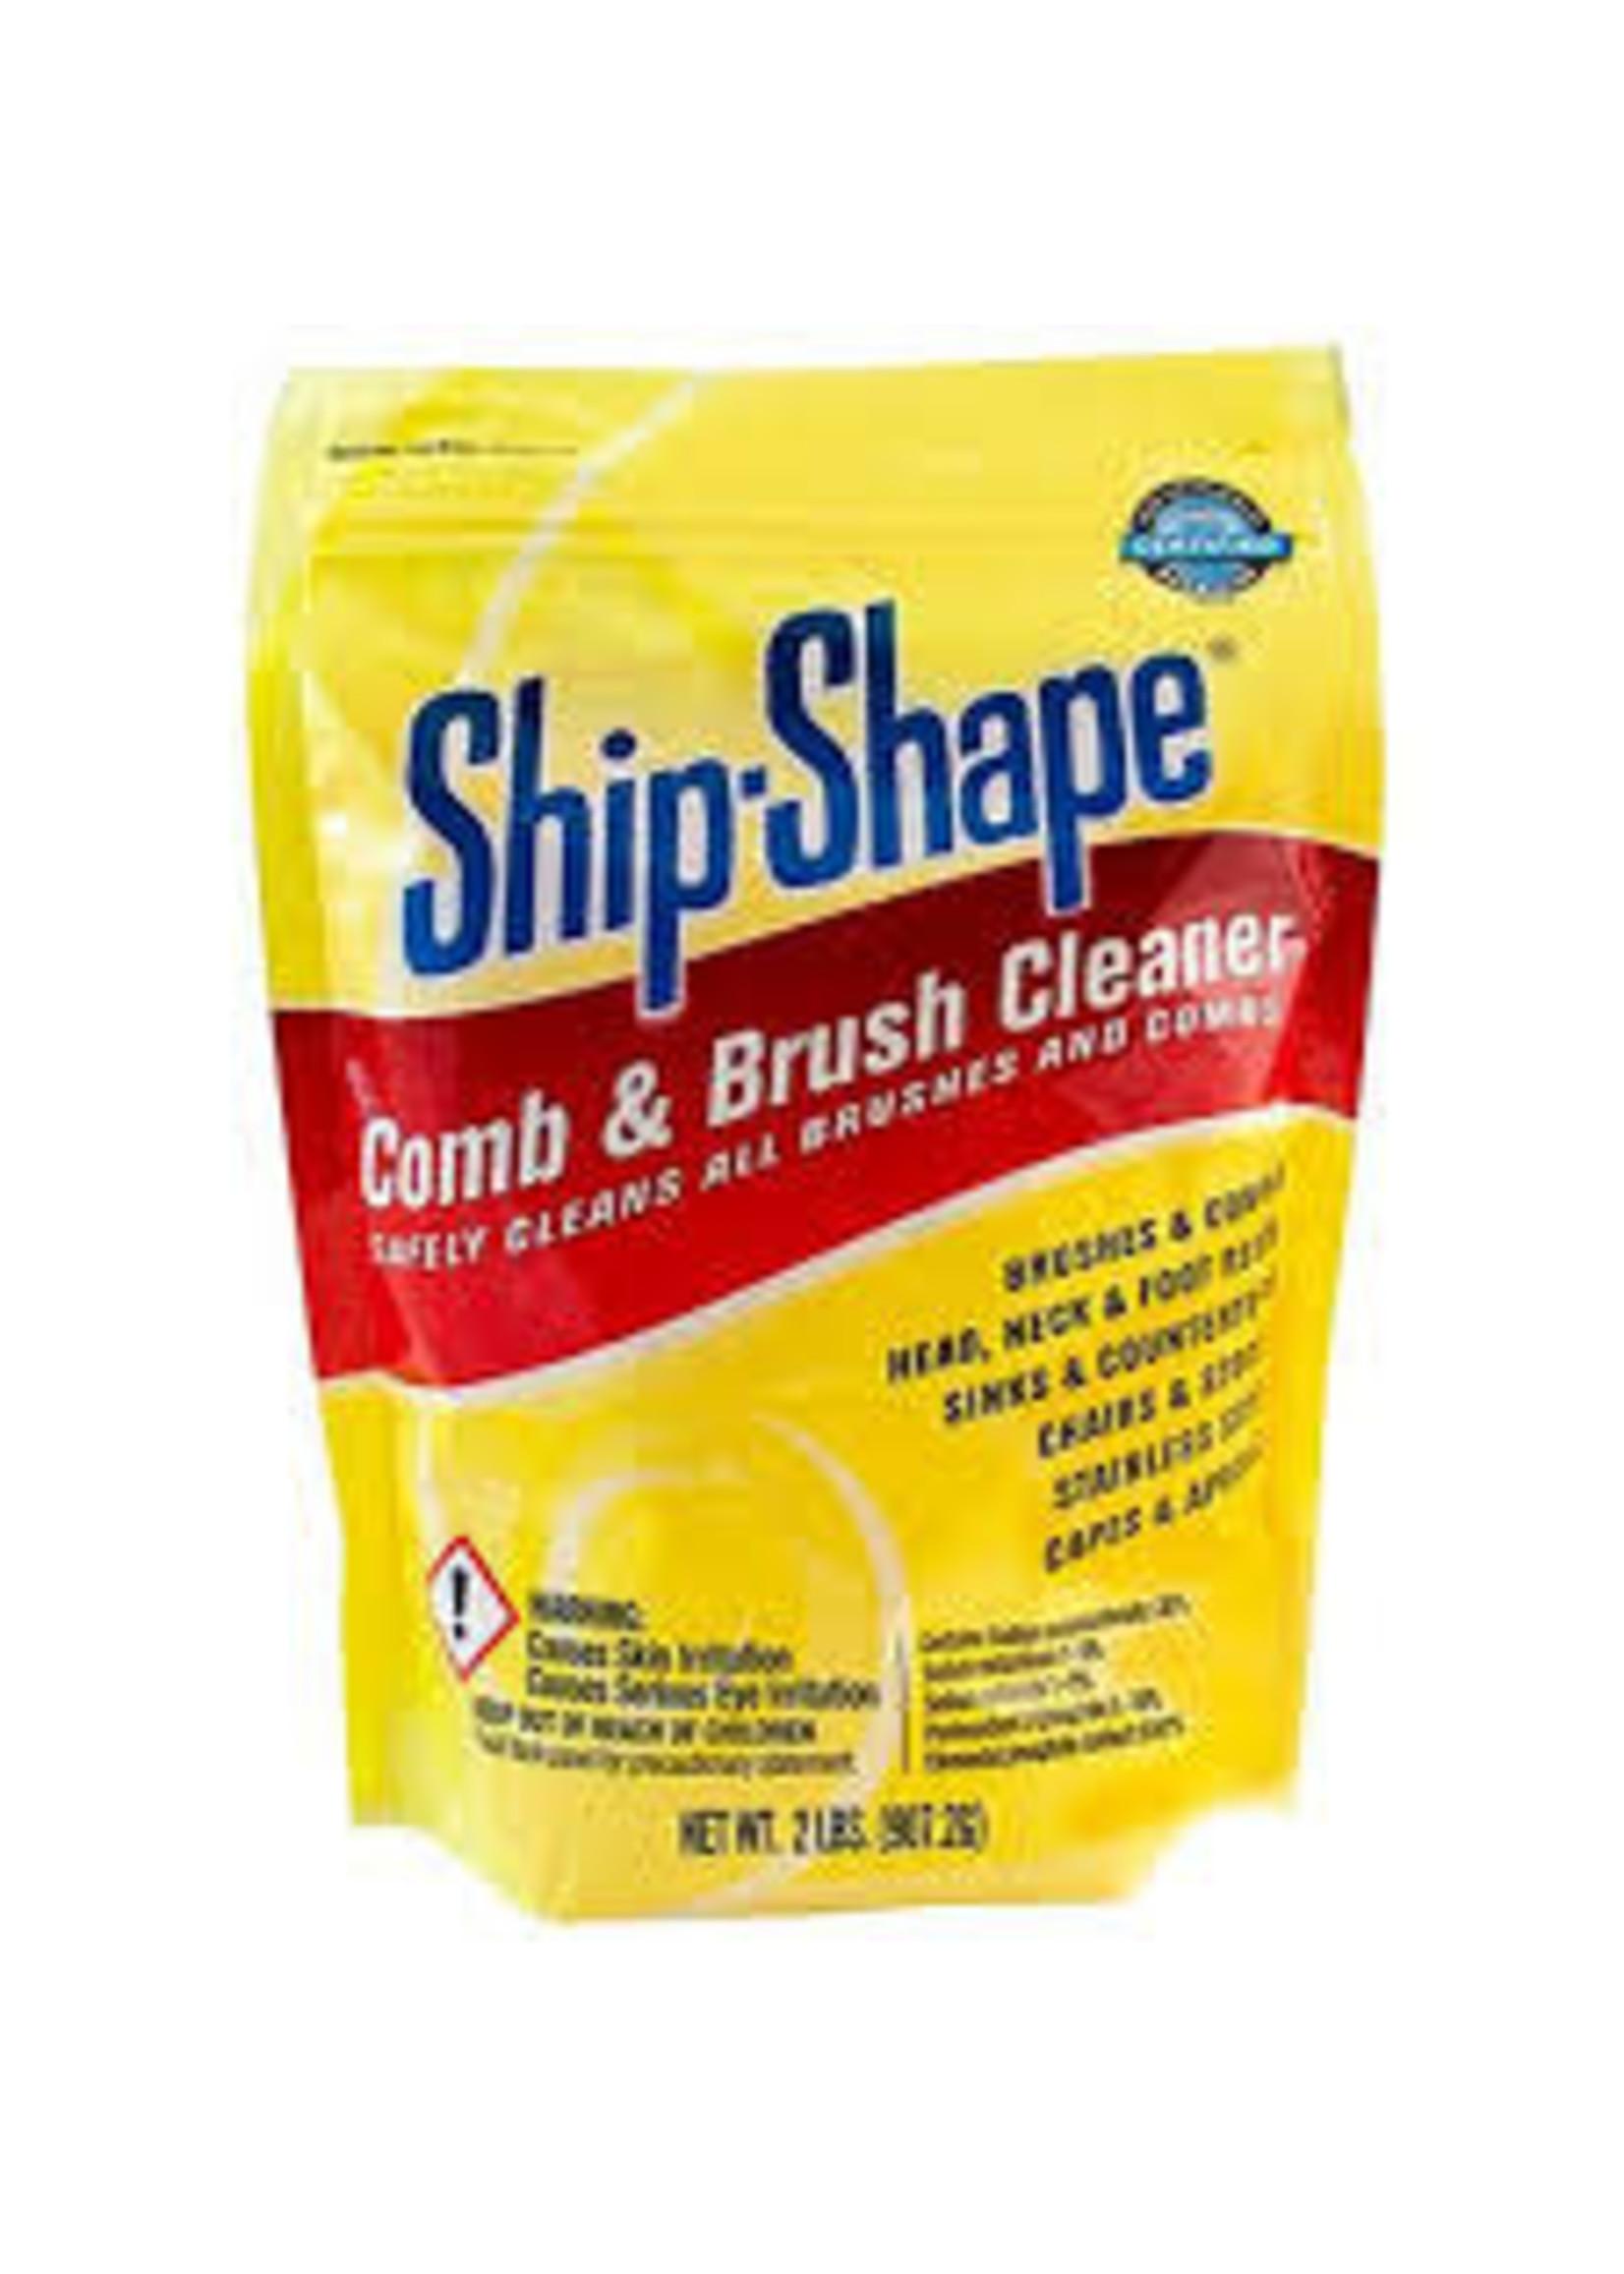 King Ship- Shape Comb & Brush Cleaner (Powder) 2lbs